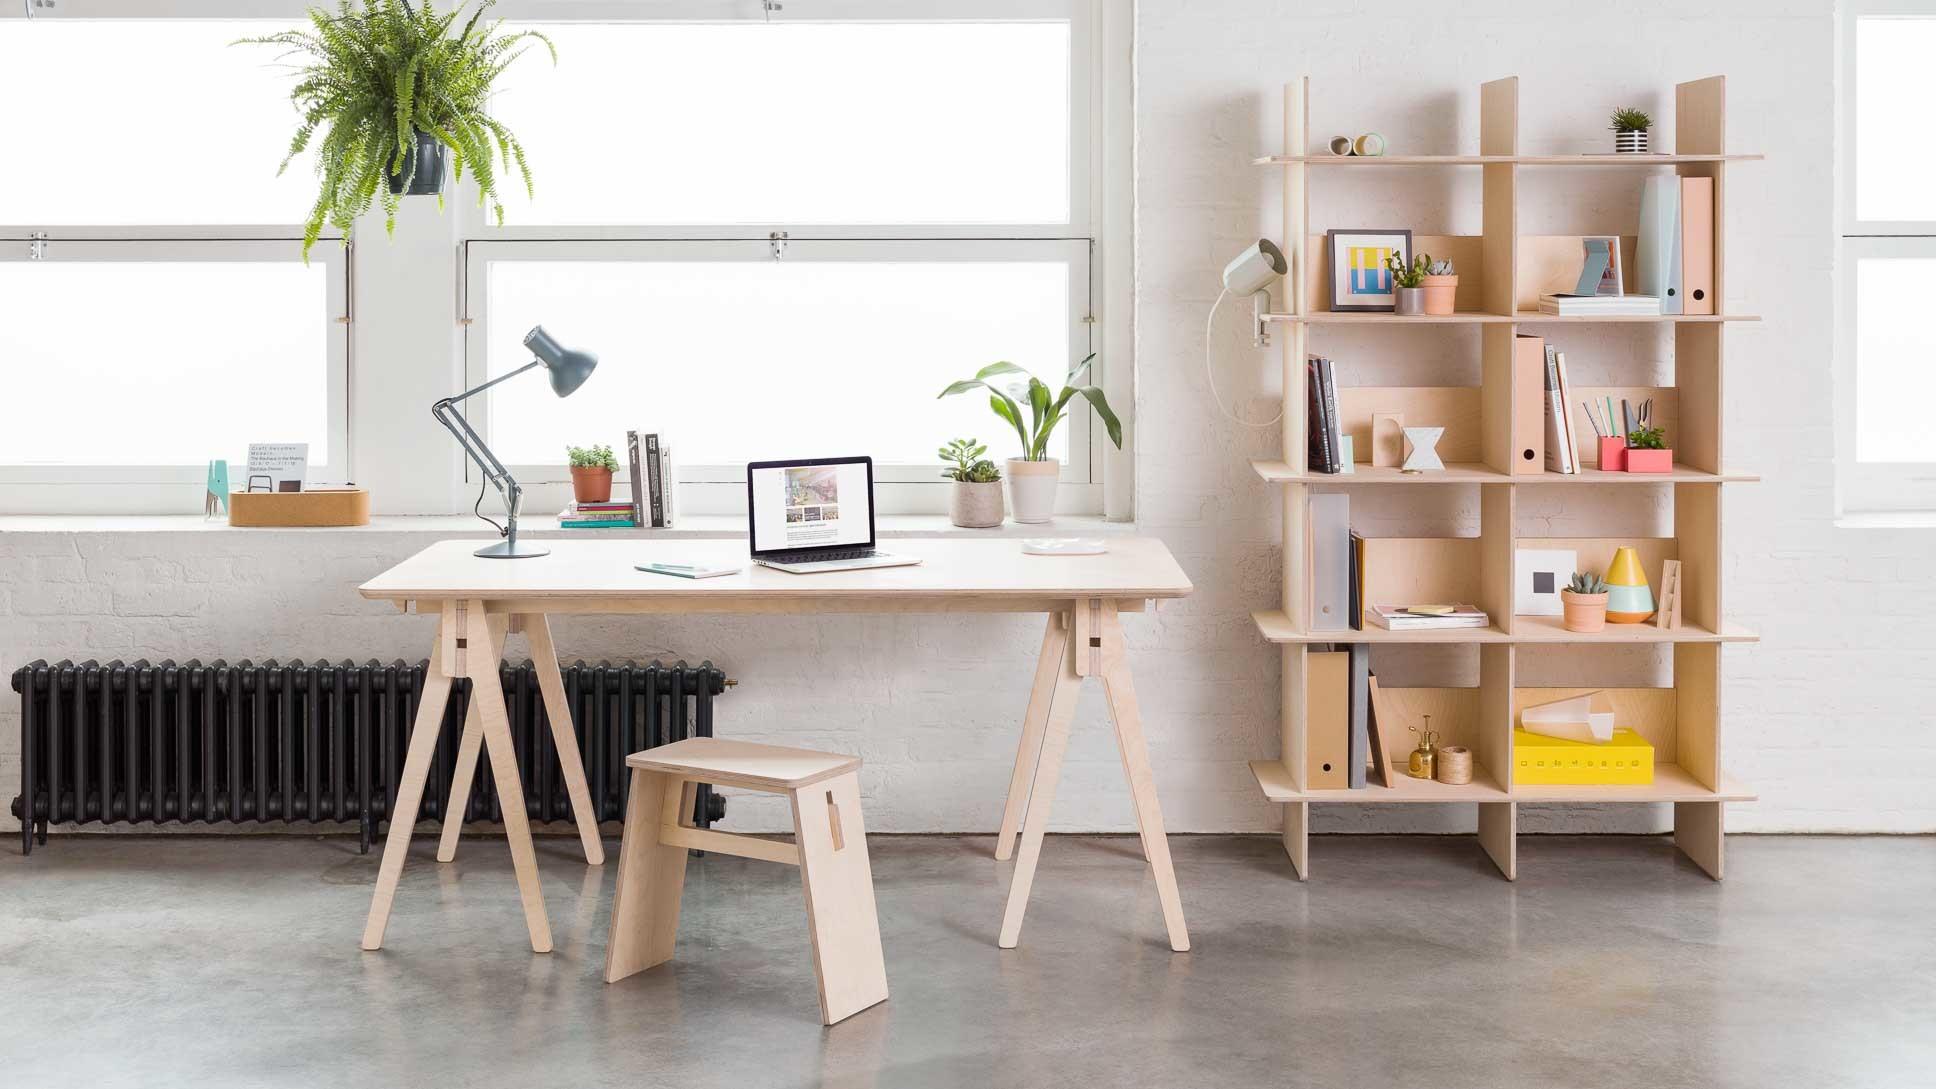 opendesk_furniture_johann-stool_product-page_gallery-image-Shot4-2244_v01_edit.default